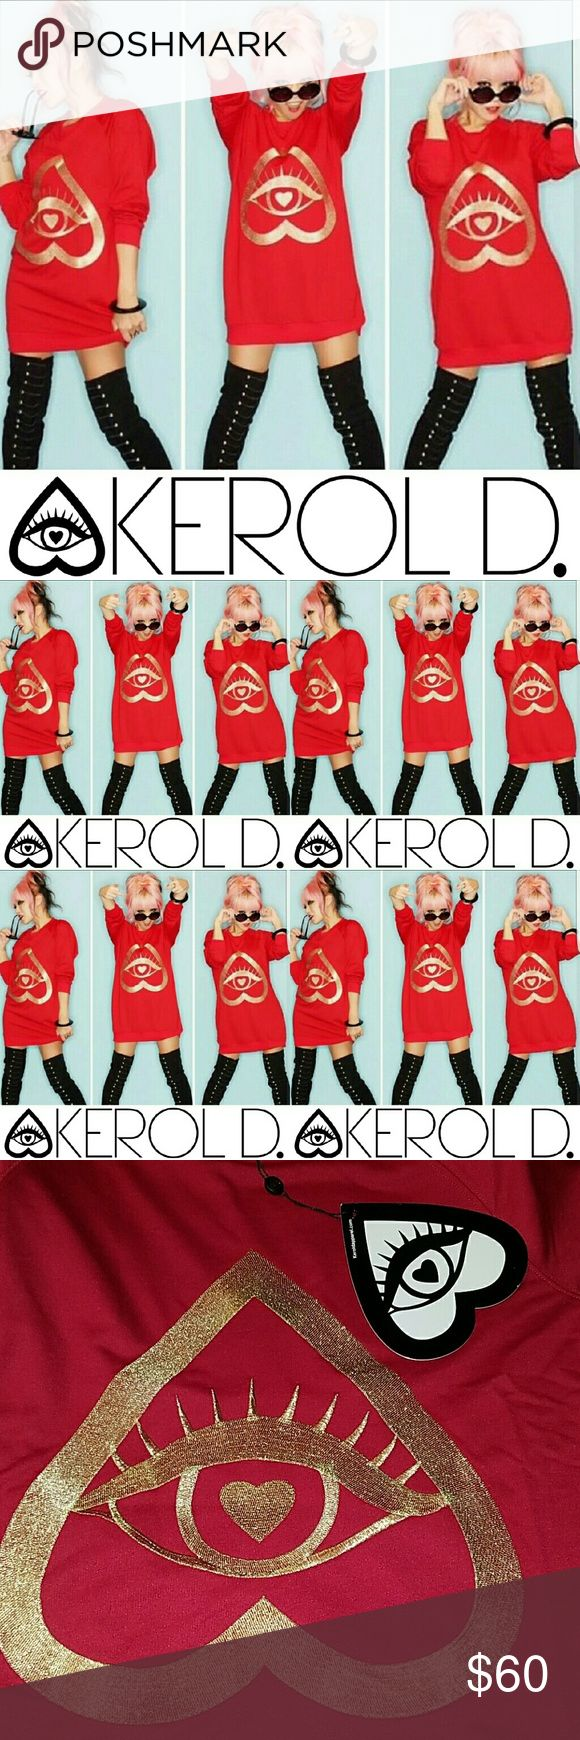 Nasty Gal Kerol D. Logo Long Jumper Sweater Boho Up for sale Nasty Gal by Kerol D. Alessa Eye Logo Long Red Jumper Sweater .  Size Small Nasty Gal by Karol D. Sweaters Crew & Scoop Necks